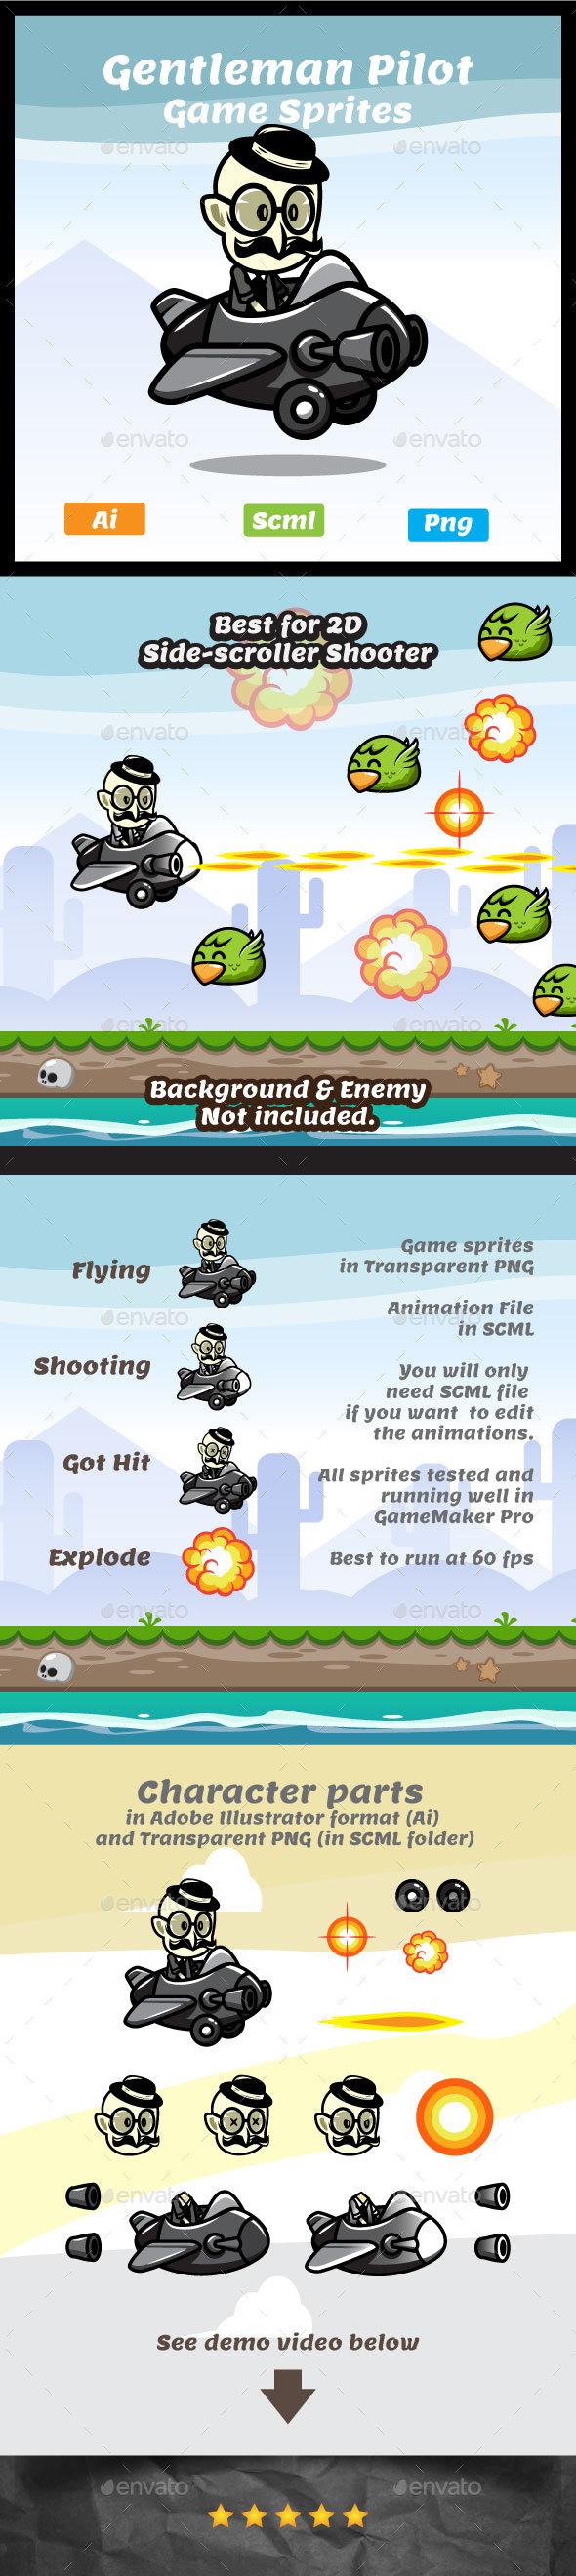 Gentleman Pilot - Aircraft Game Asset Sprites - Sprites Game Assets